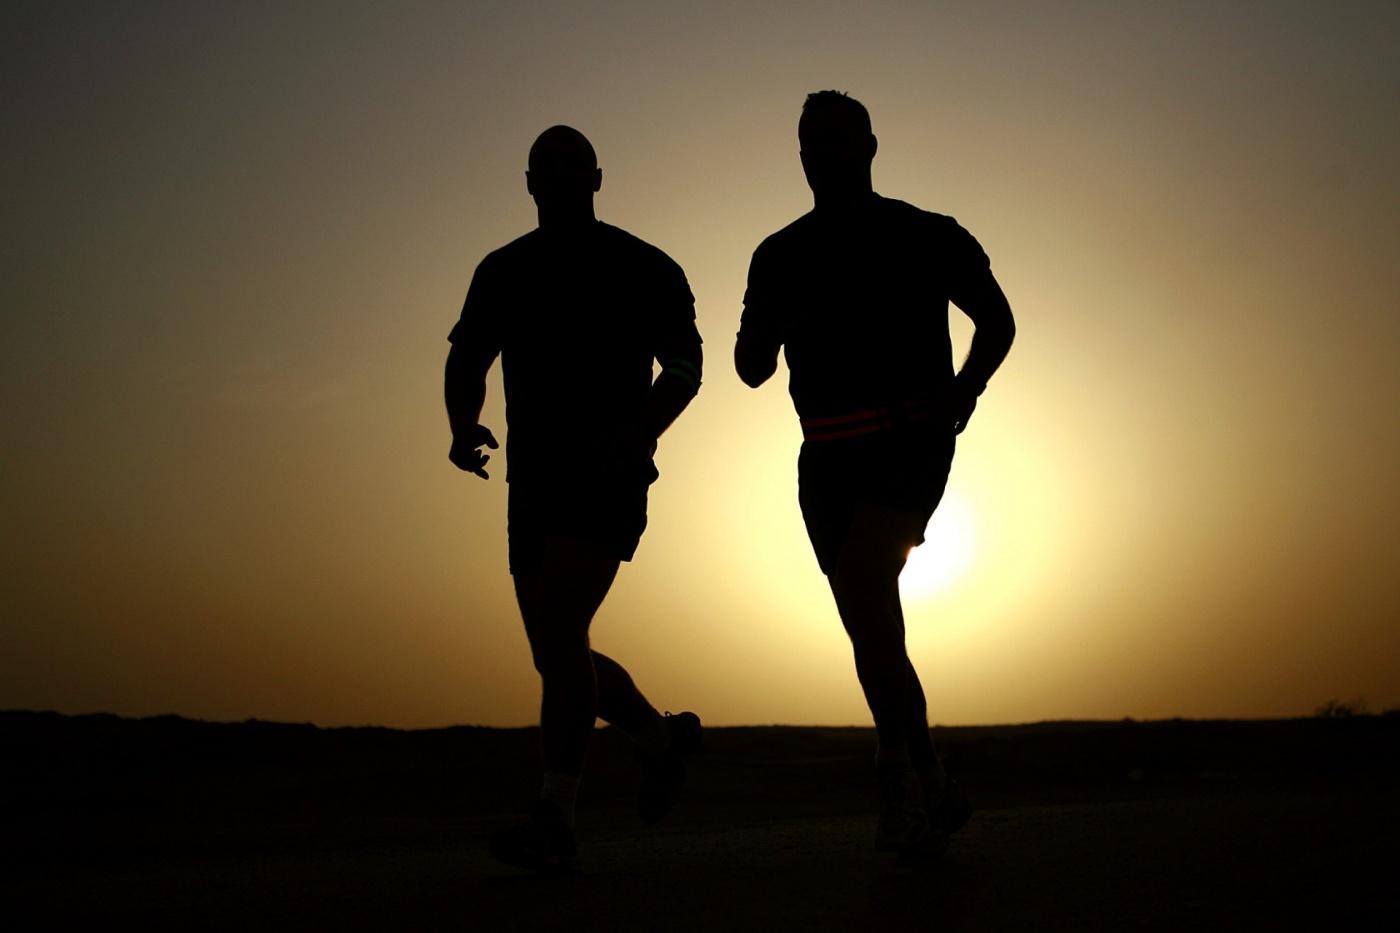 runners-training-at-sunset